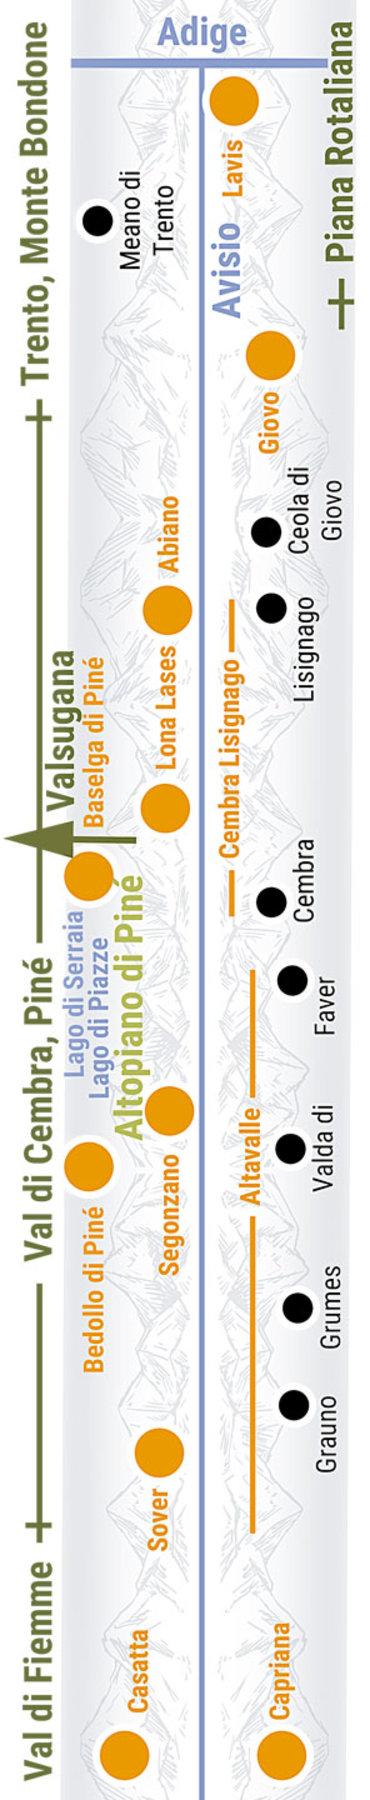 Übersichtskarte rechts Teilabschnitt 30 Val Di Cembra